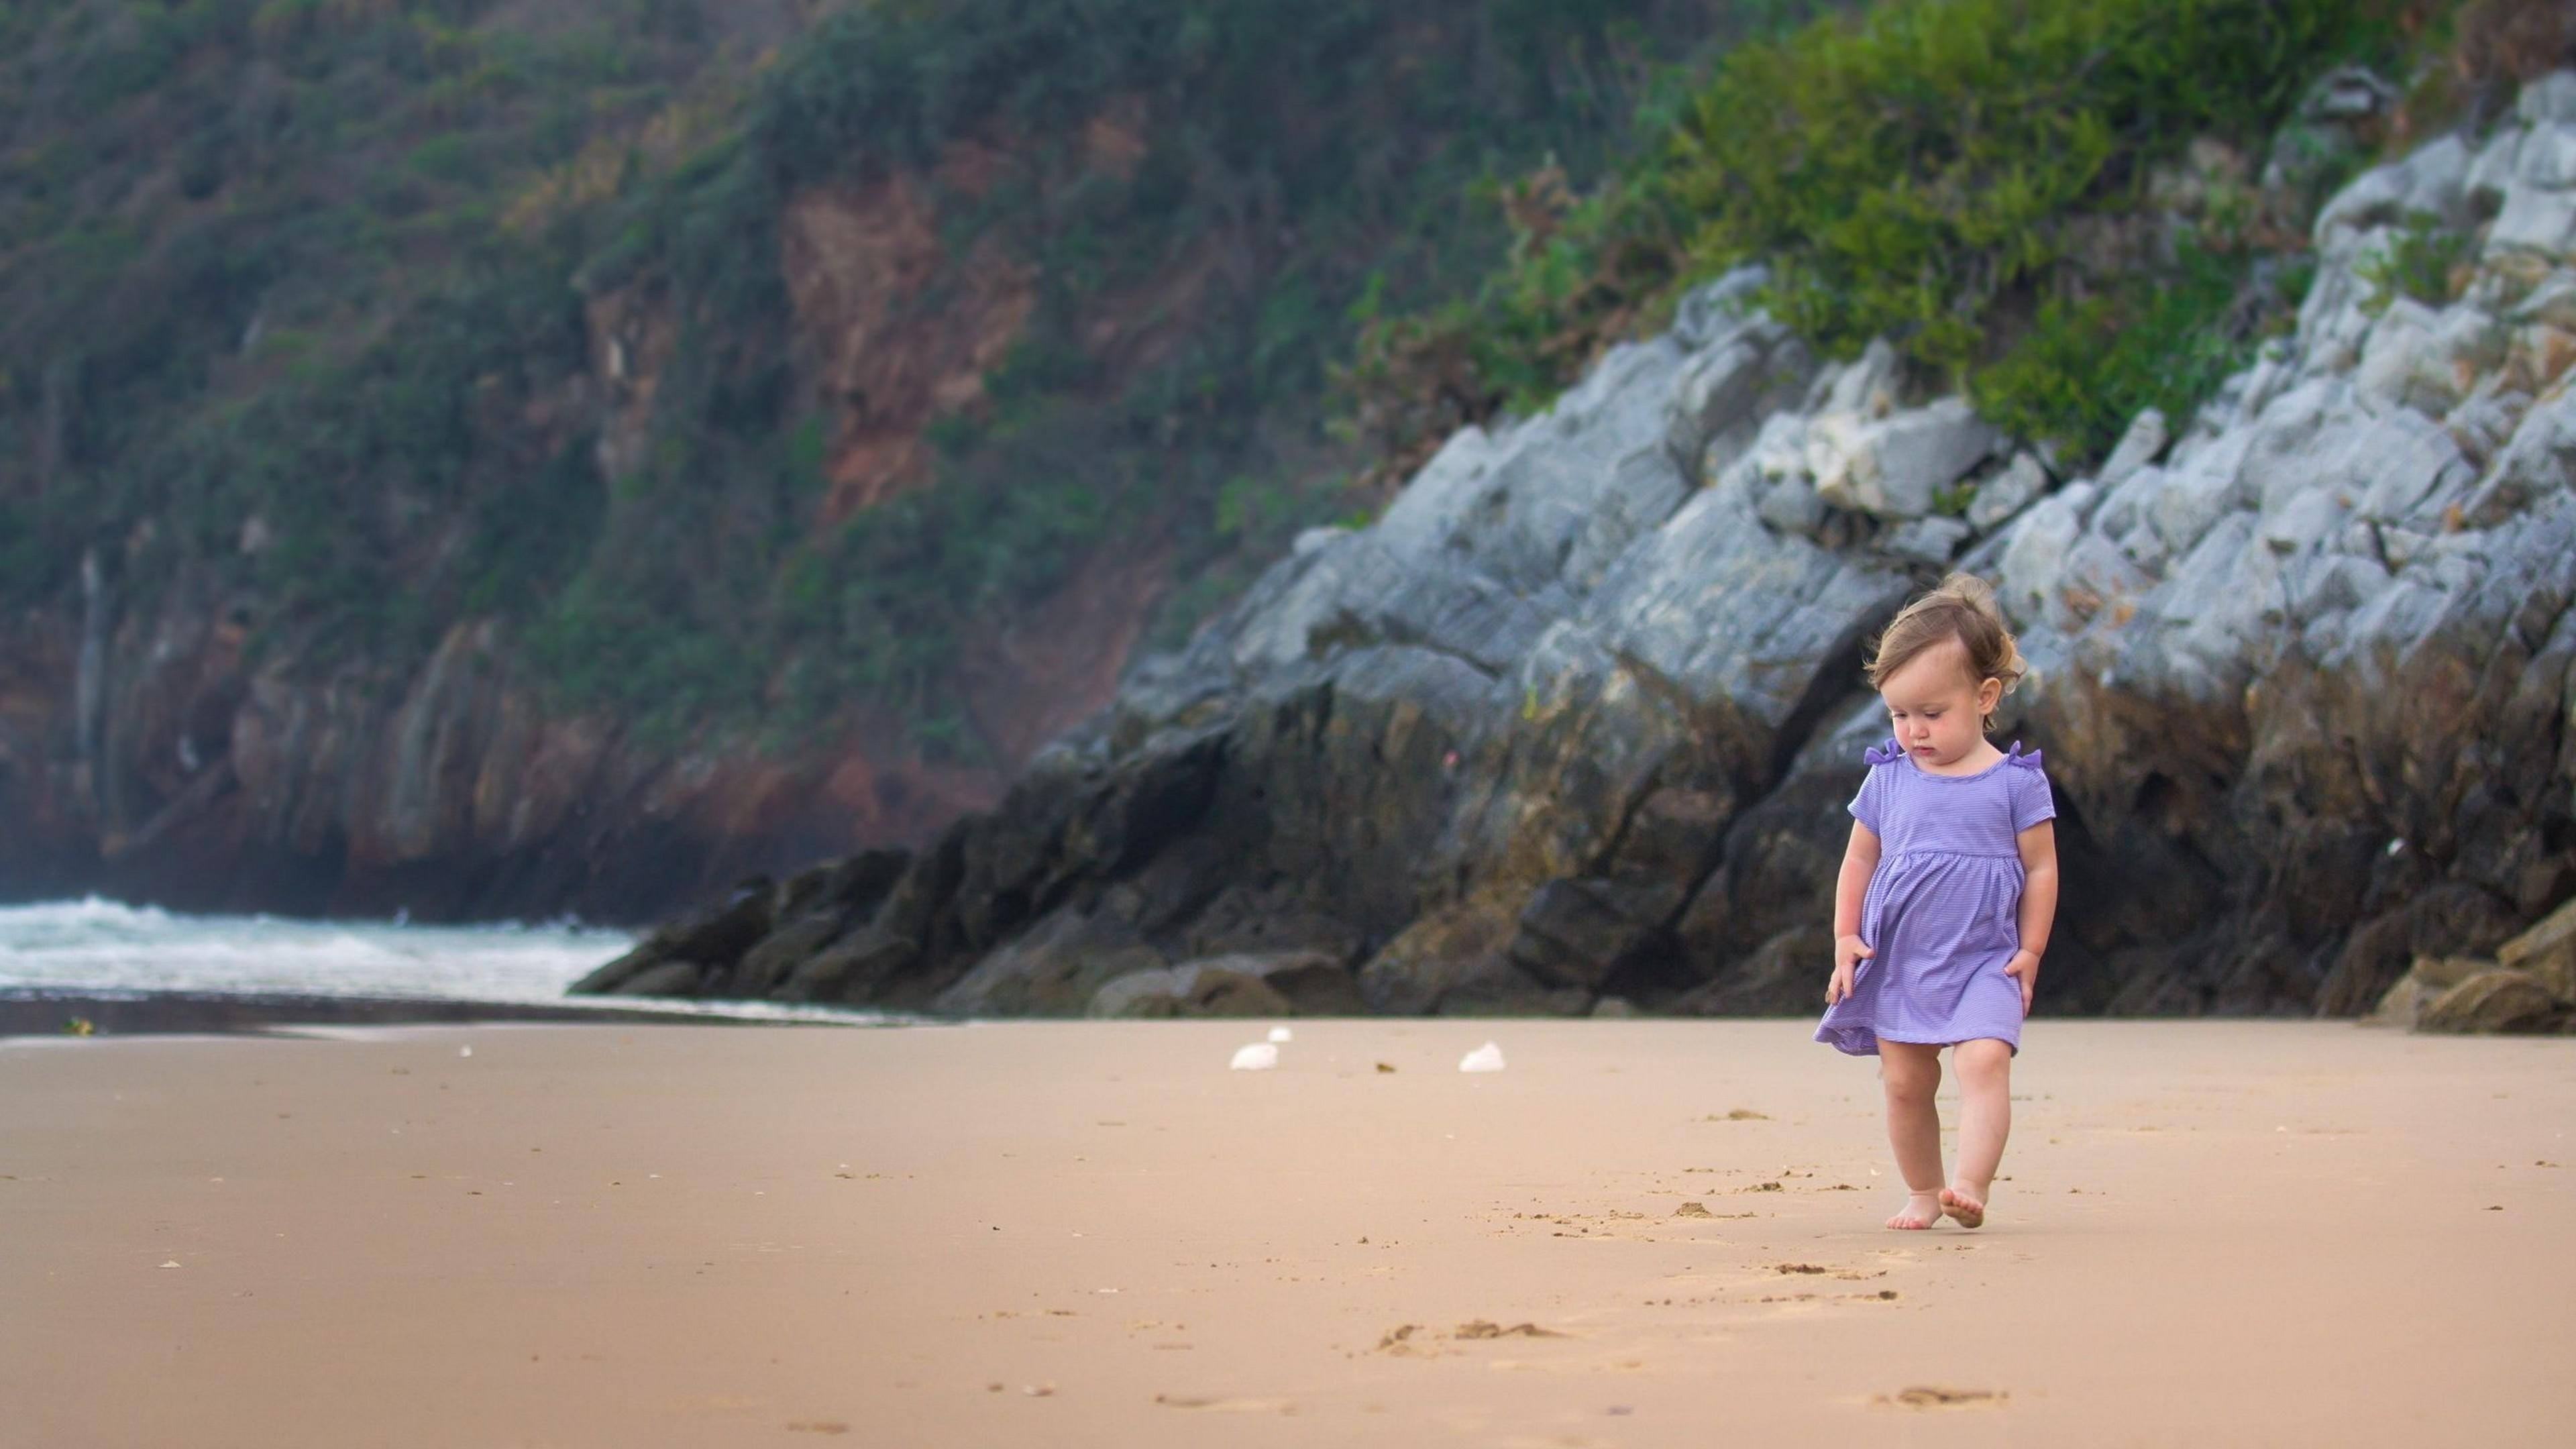 x-Baby-at-beach-1920x1080-r-wallpaper-wpc5801690